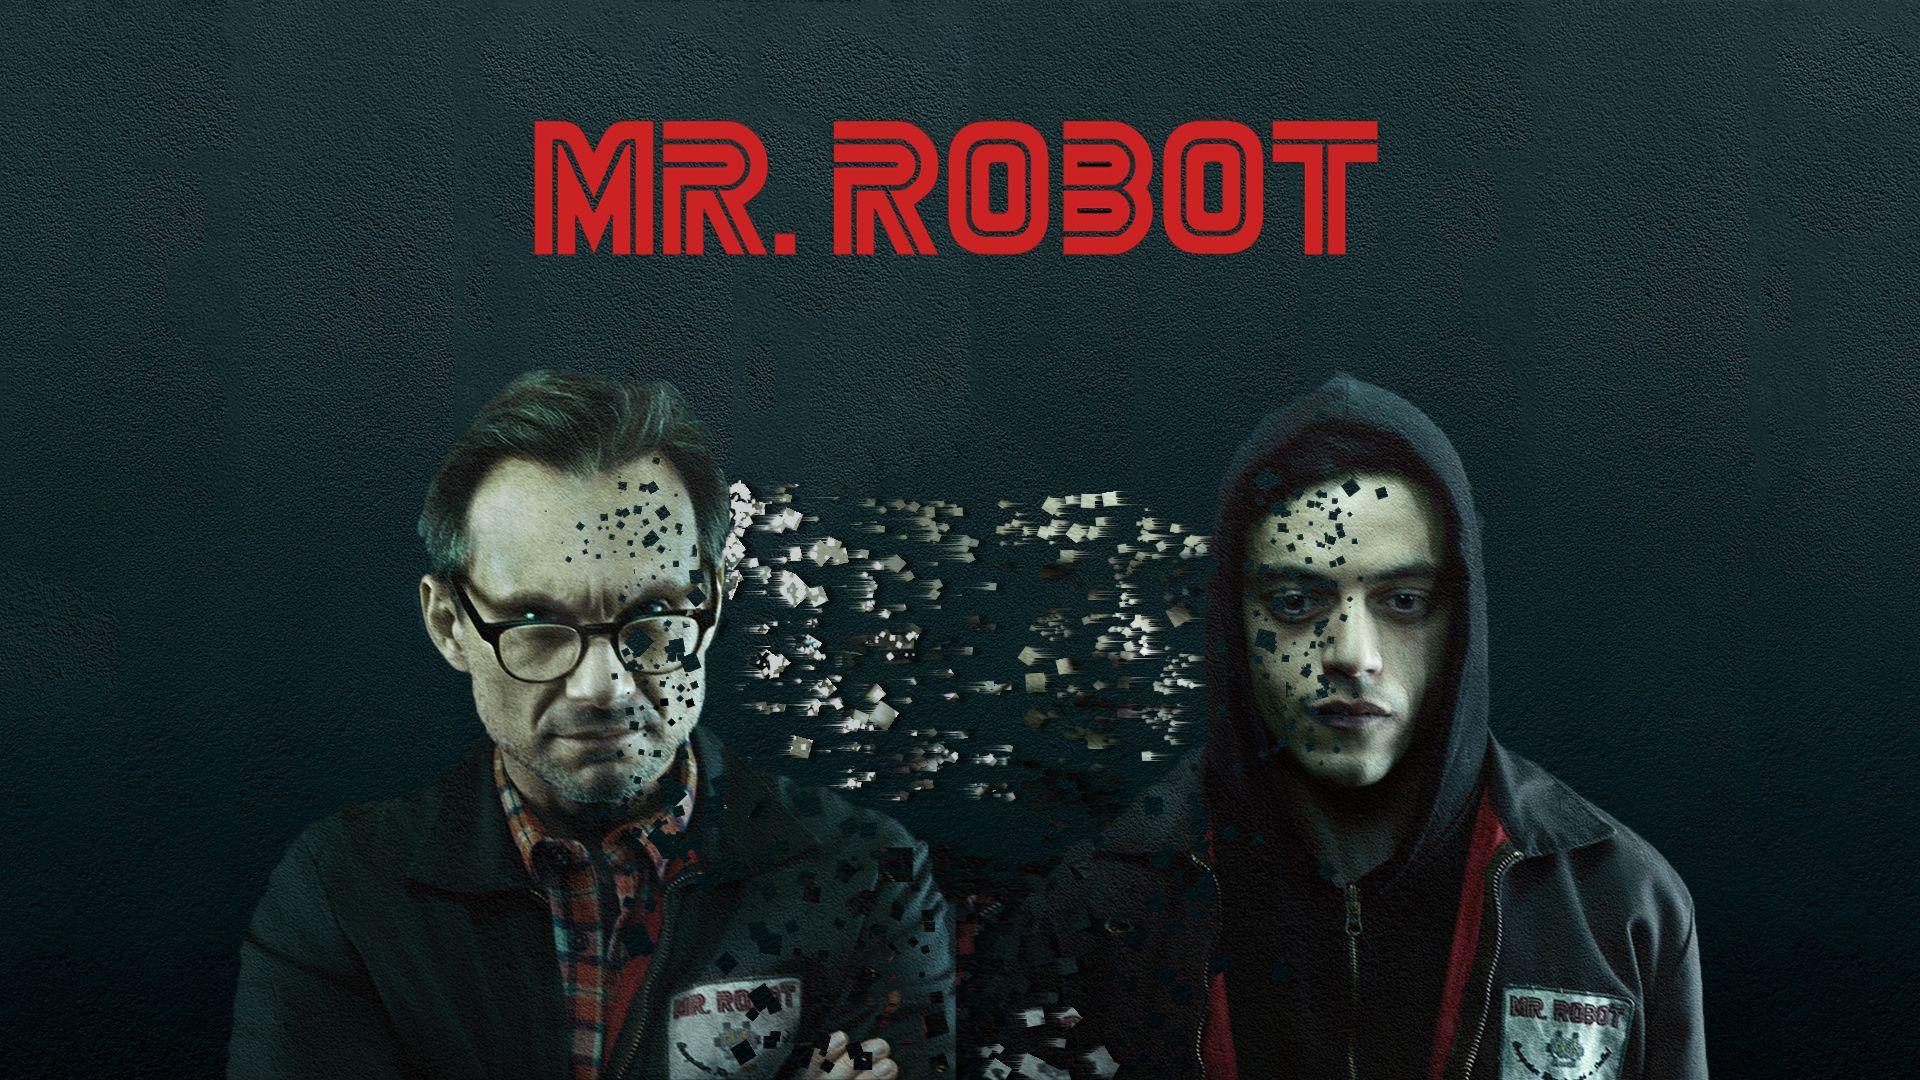 Mr Robot Season 4 Details Wallpapers For All Fans Mega